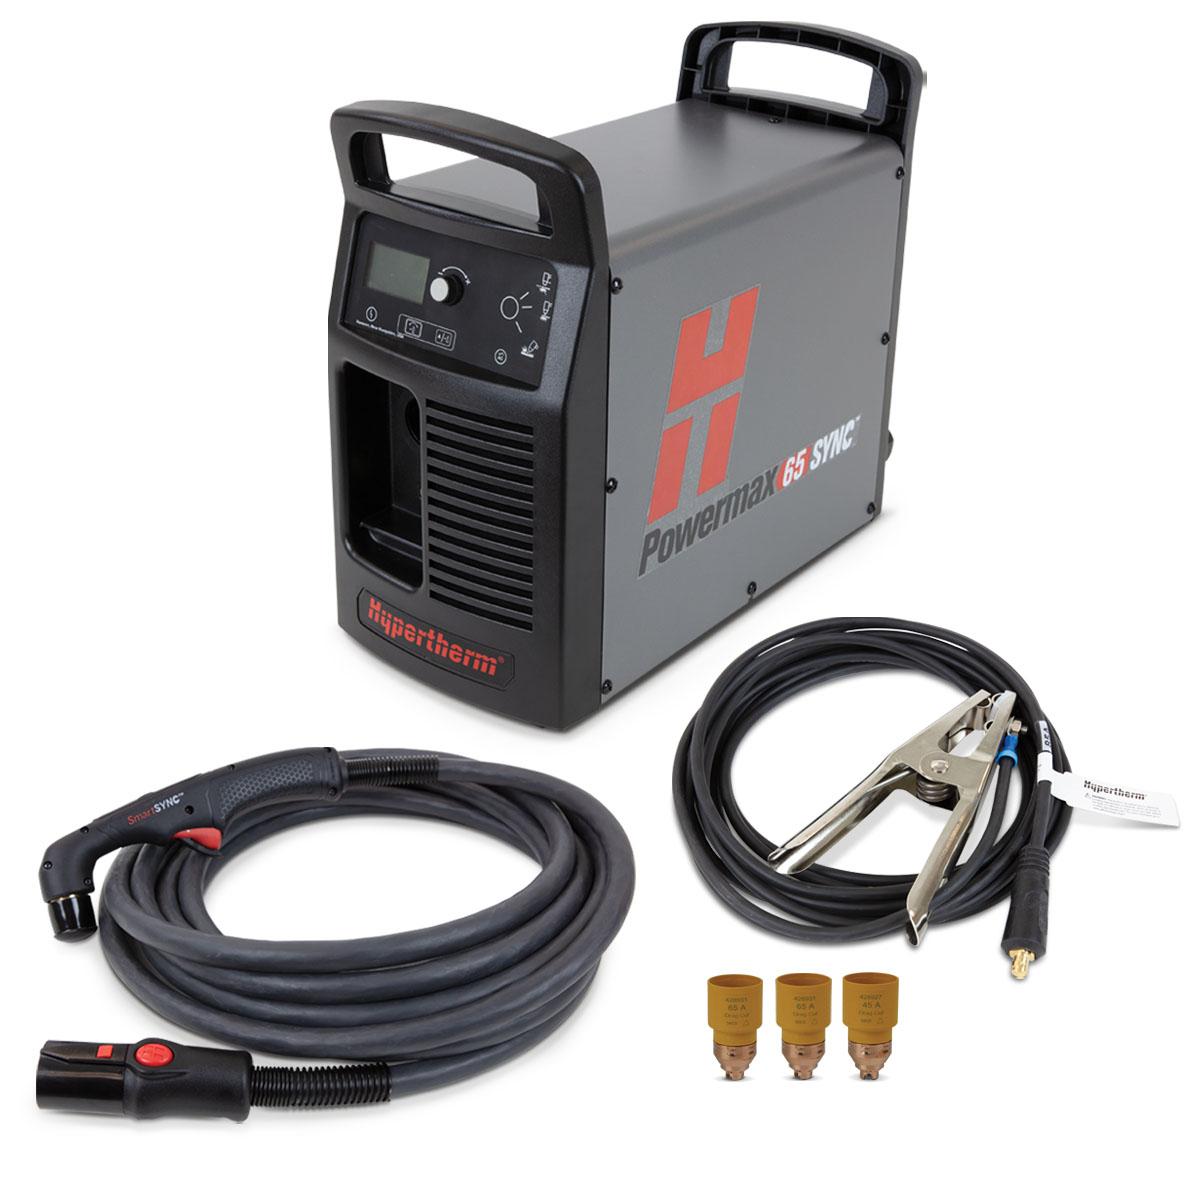 Hypertherm Powermax65 SYNC 415V Package